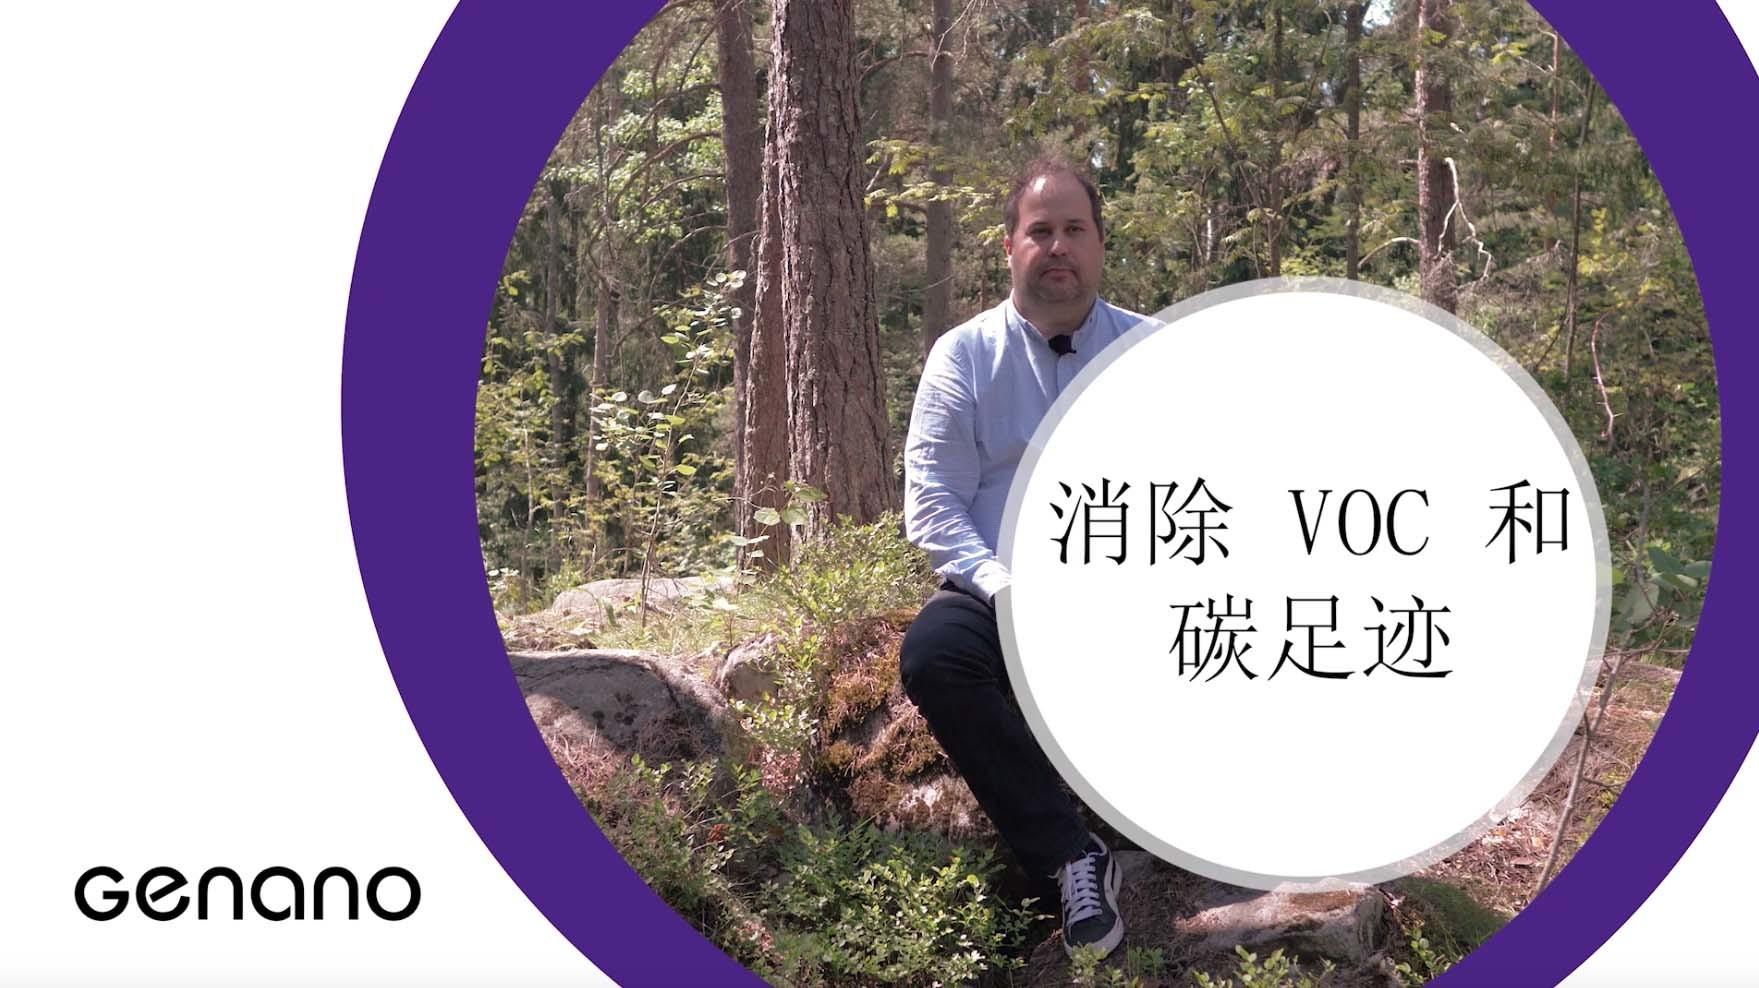 VOC_final_HD_CN